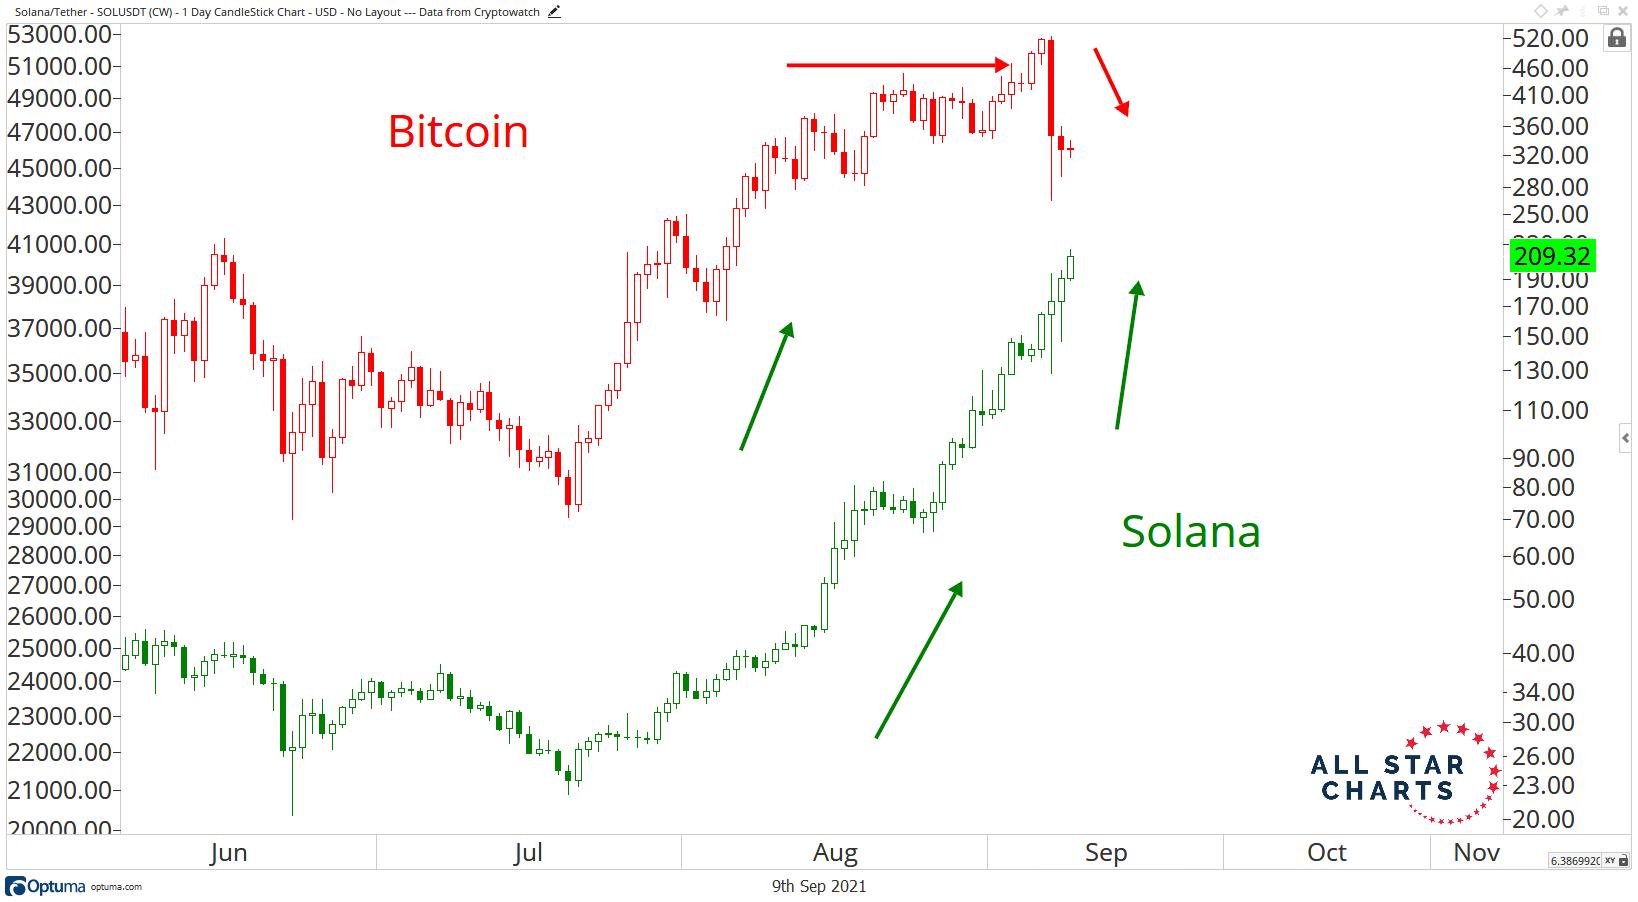 Solana relative strength vs. Bitcoin